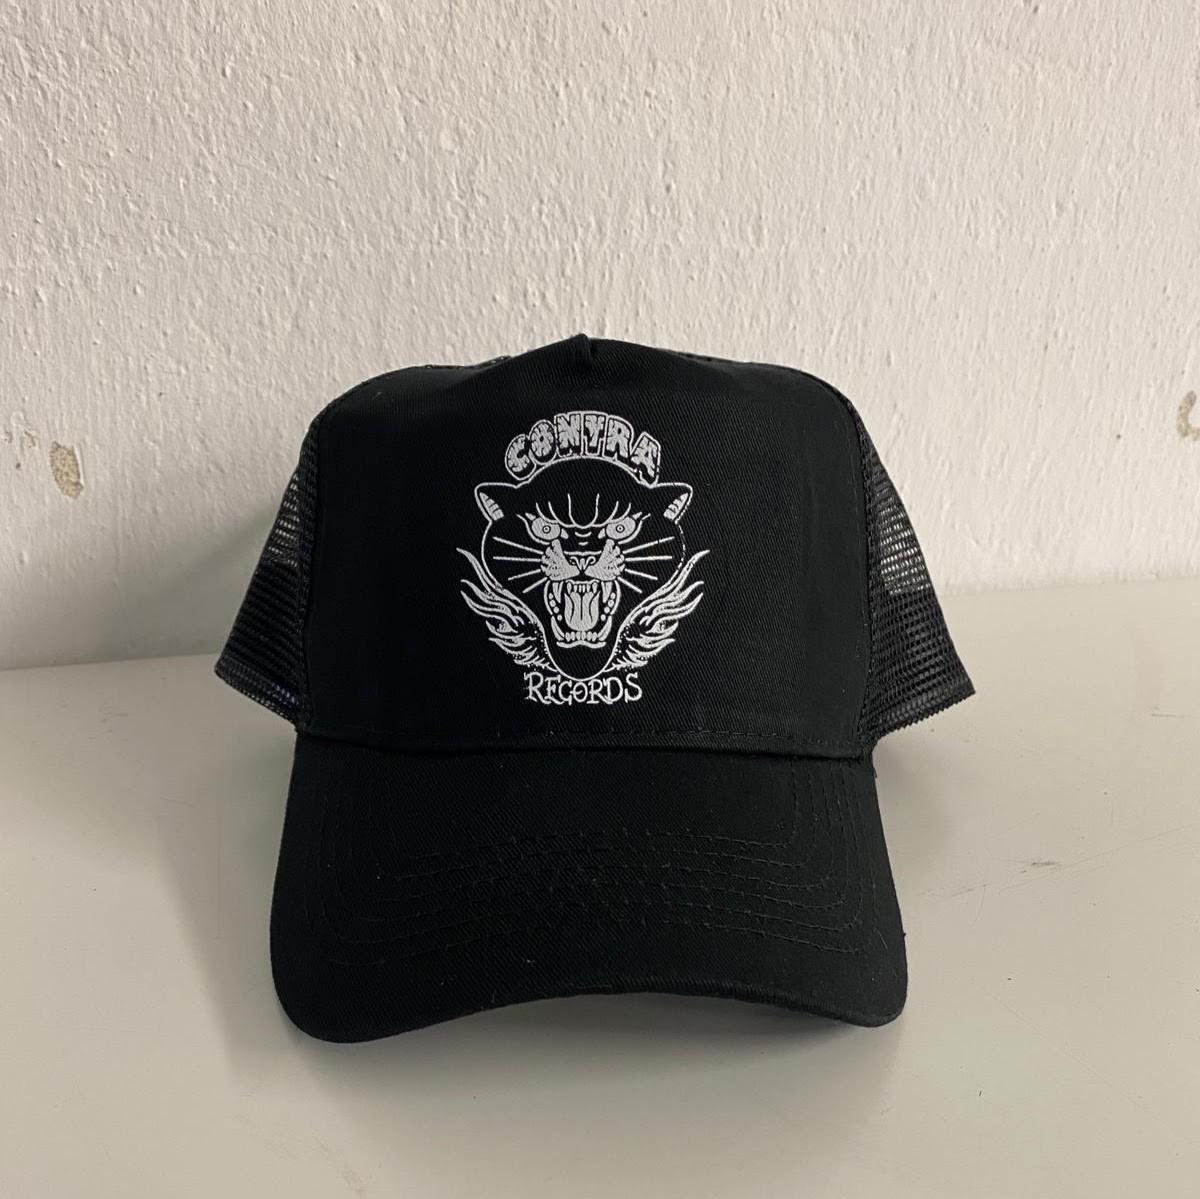 "Contra Records ""Black Panther"" - Trucker Cap black"